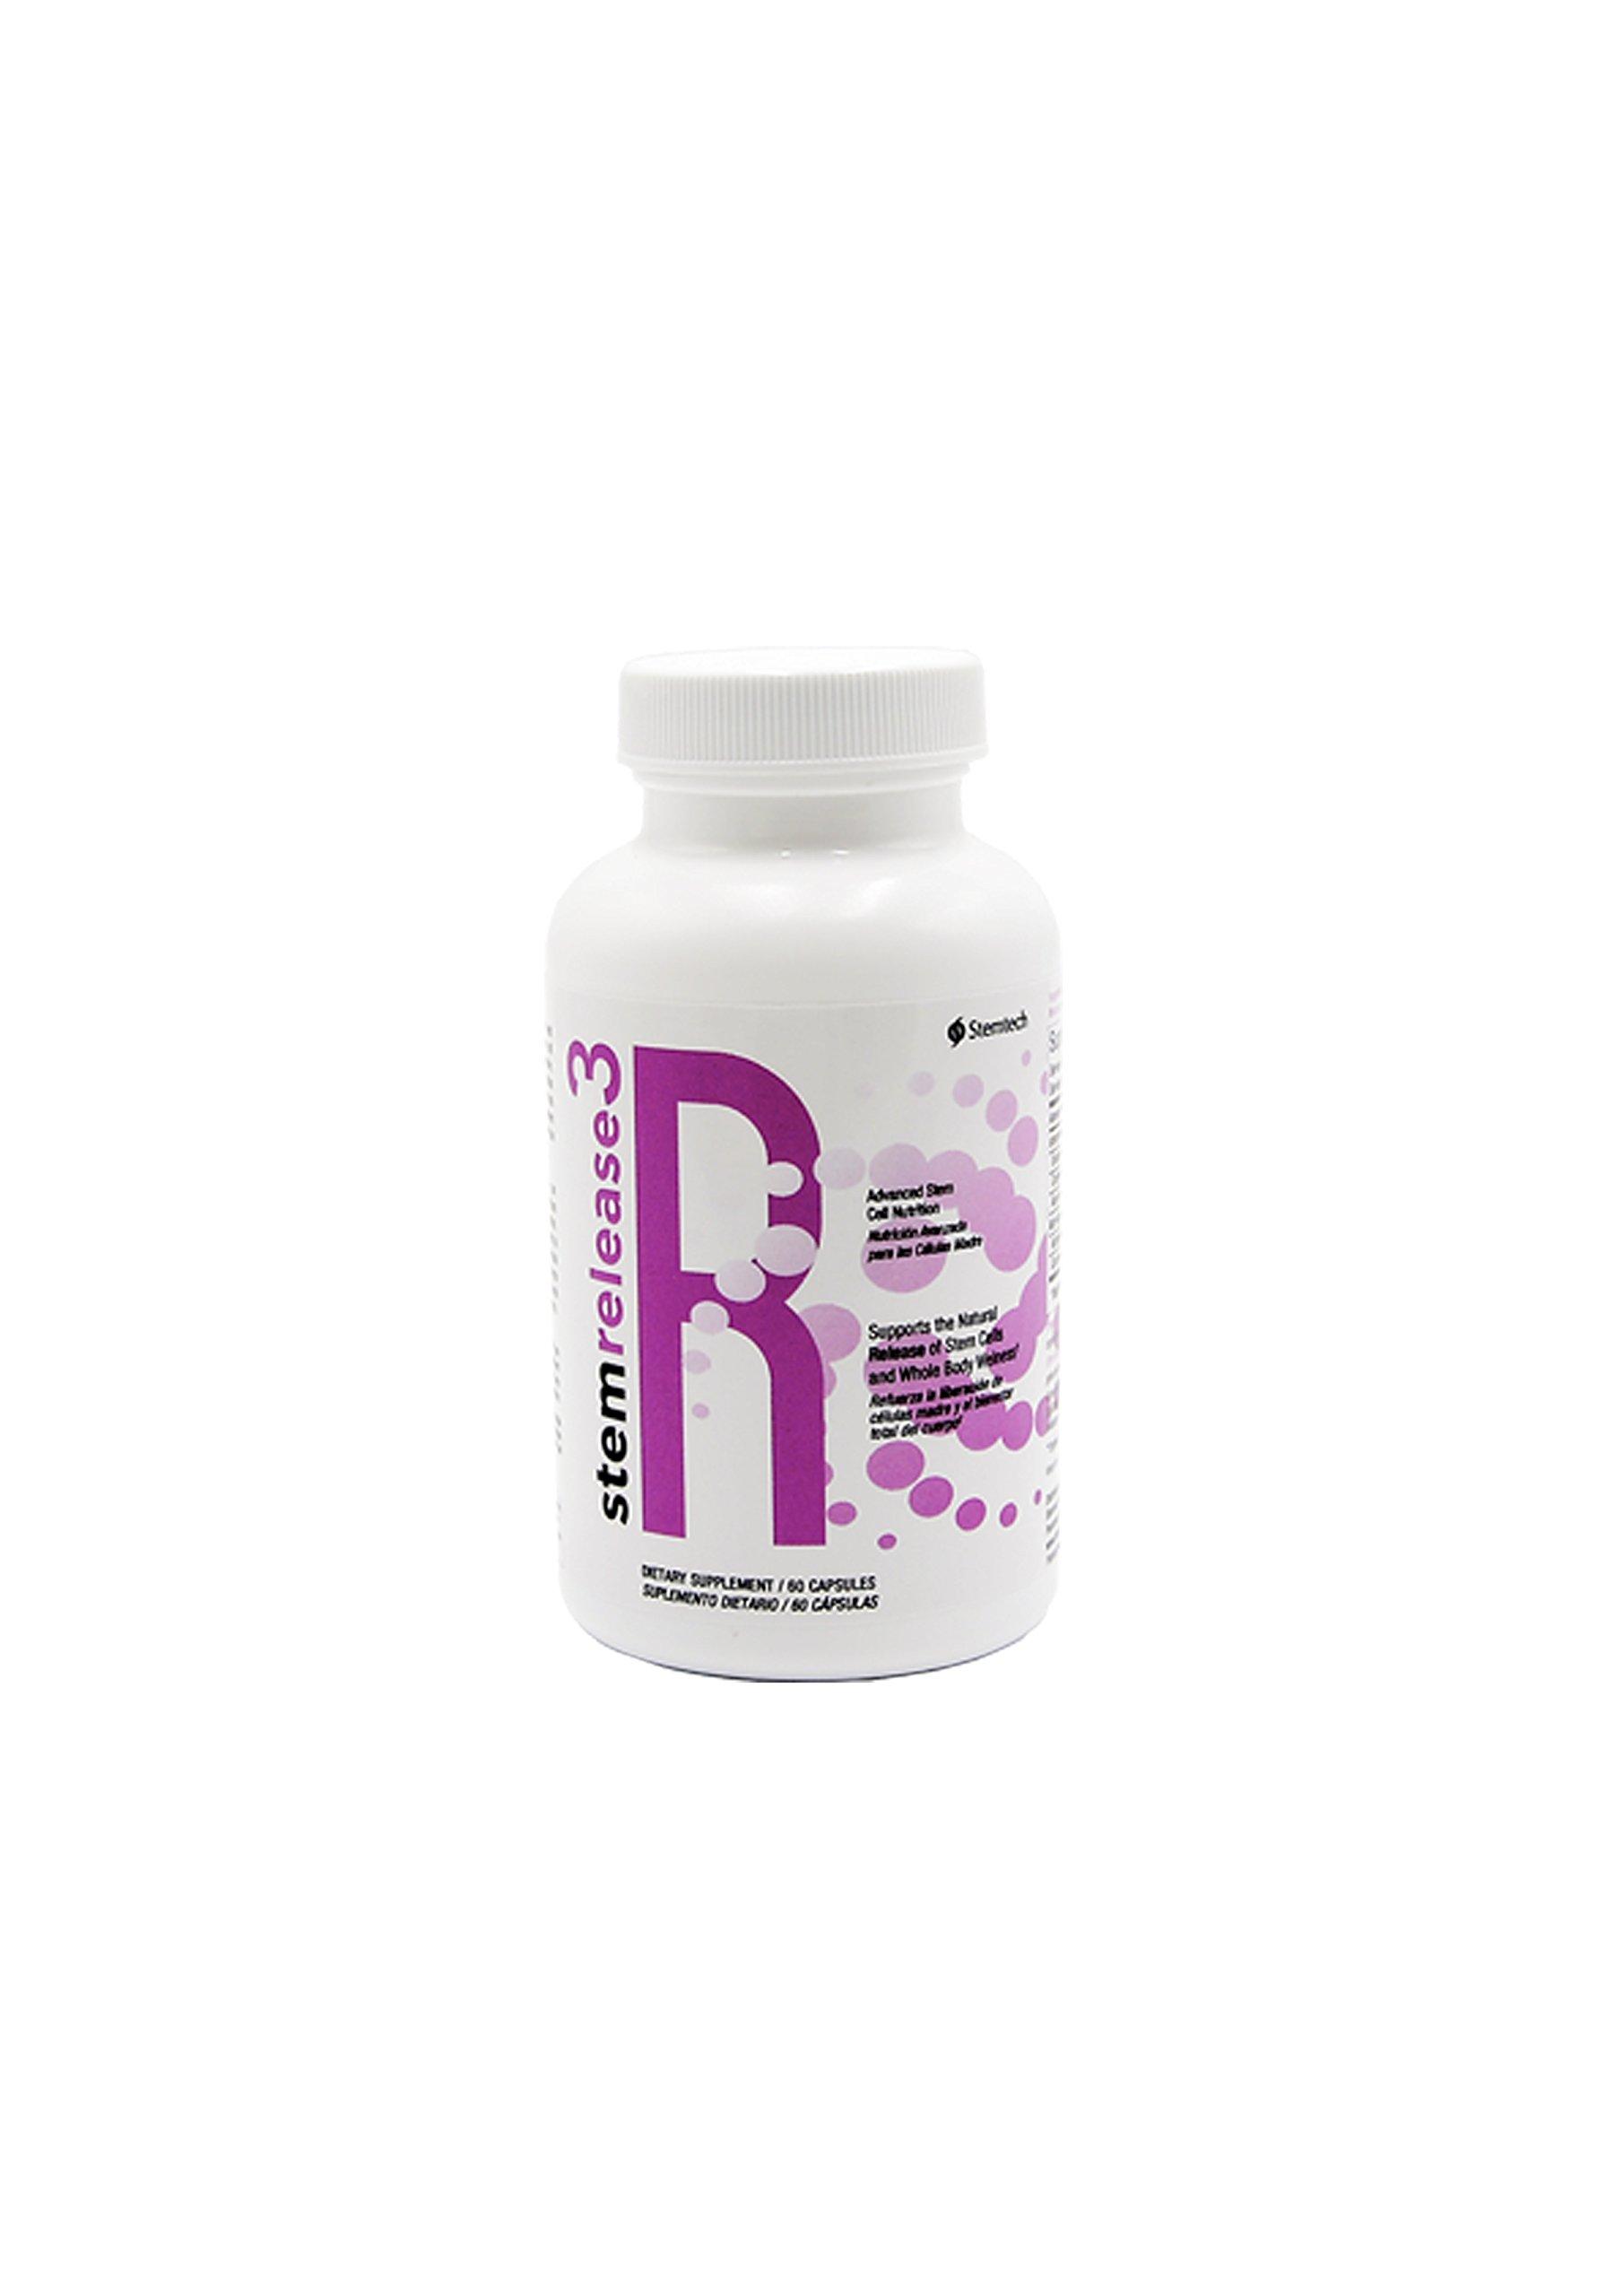 StemRelease3 SE3 60 capsules by Stemtech Health